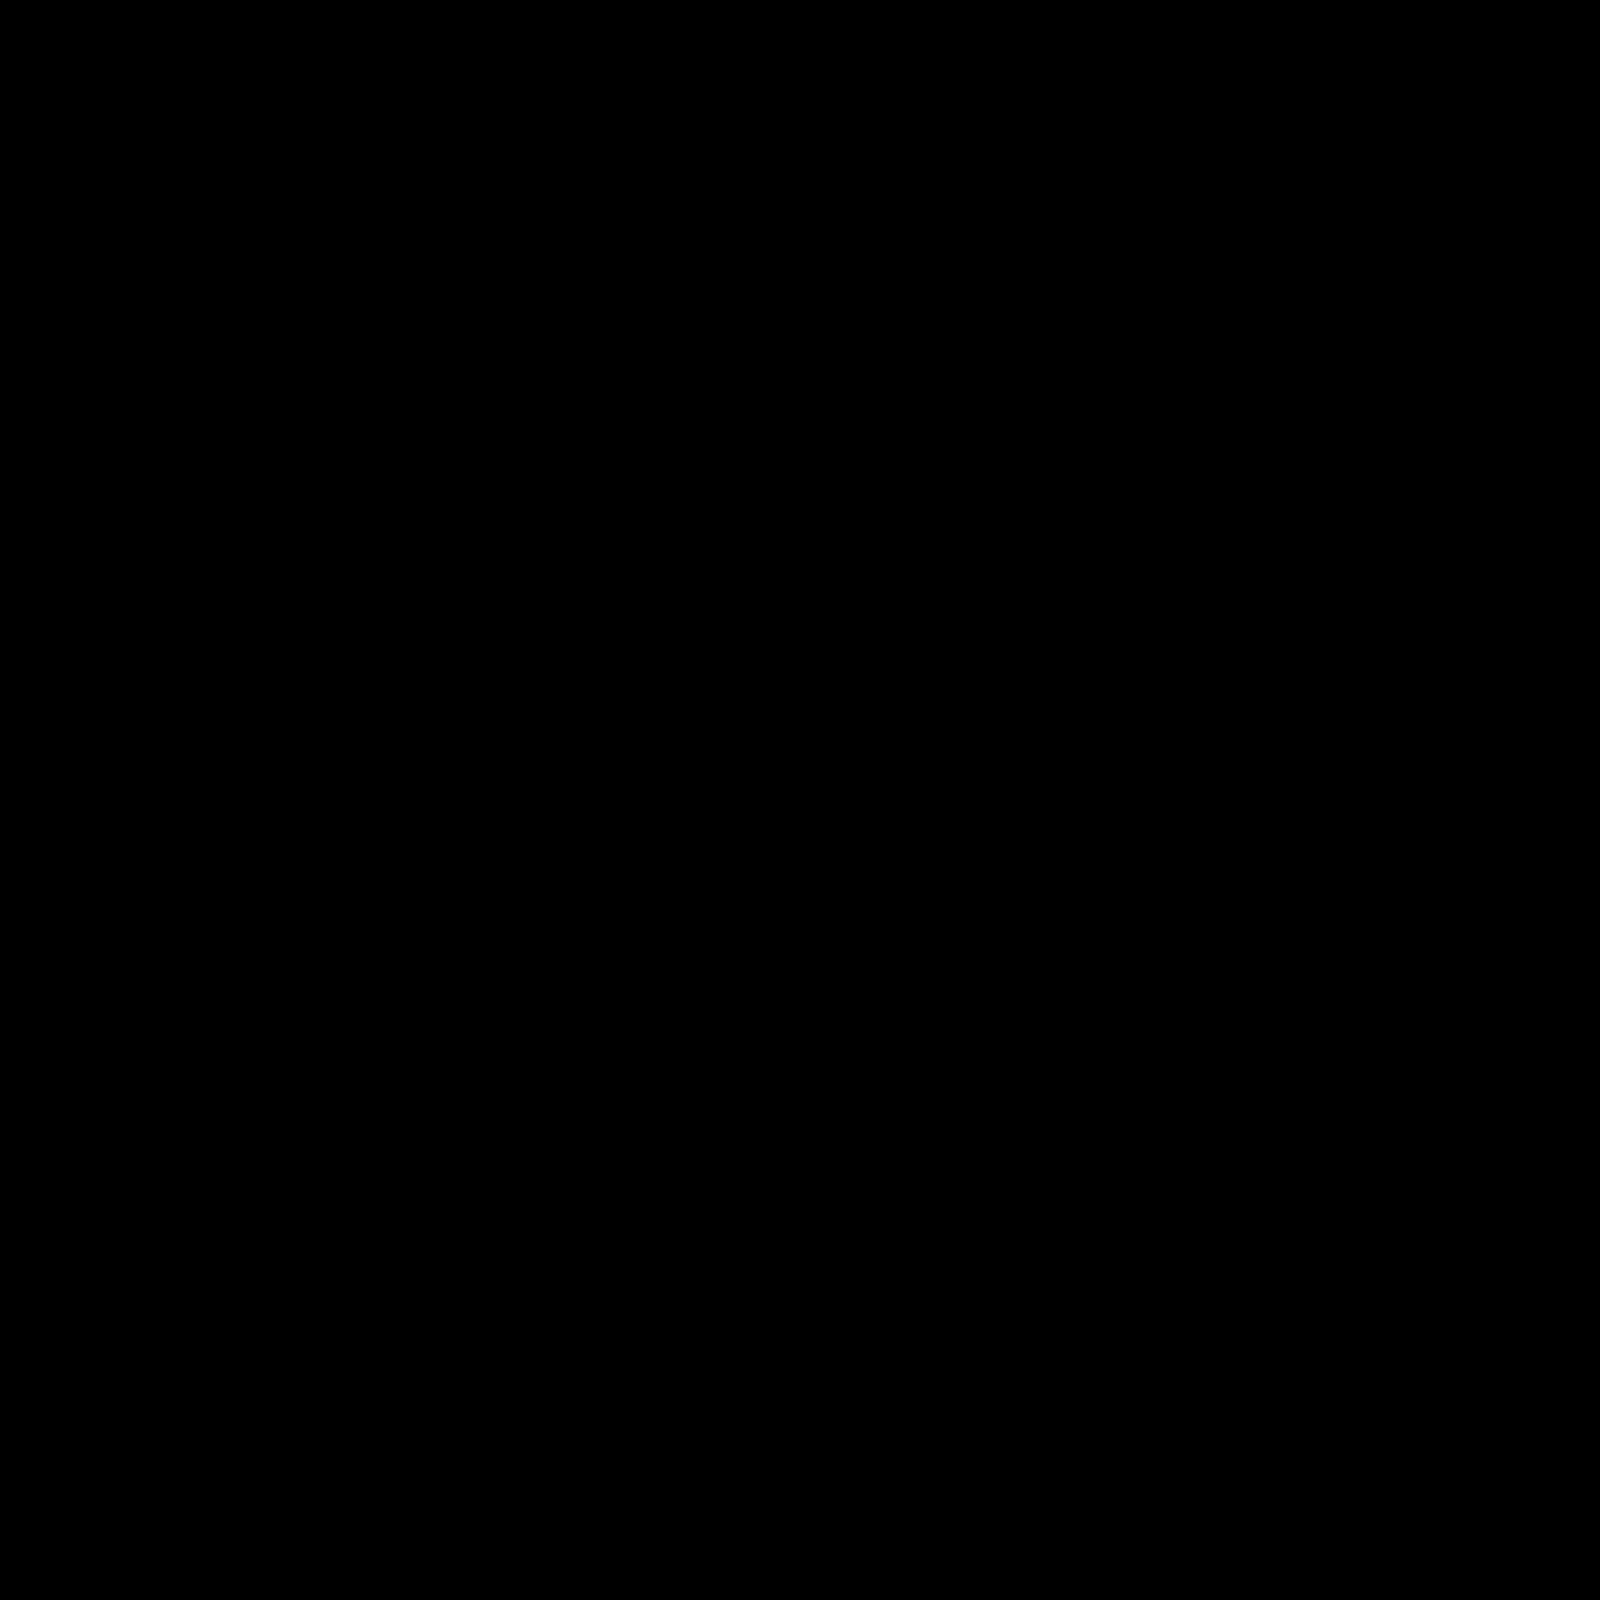 1600x1600 Triforce Icon